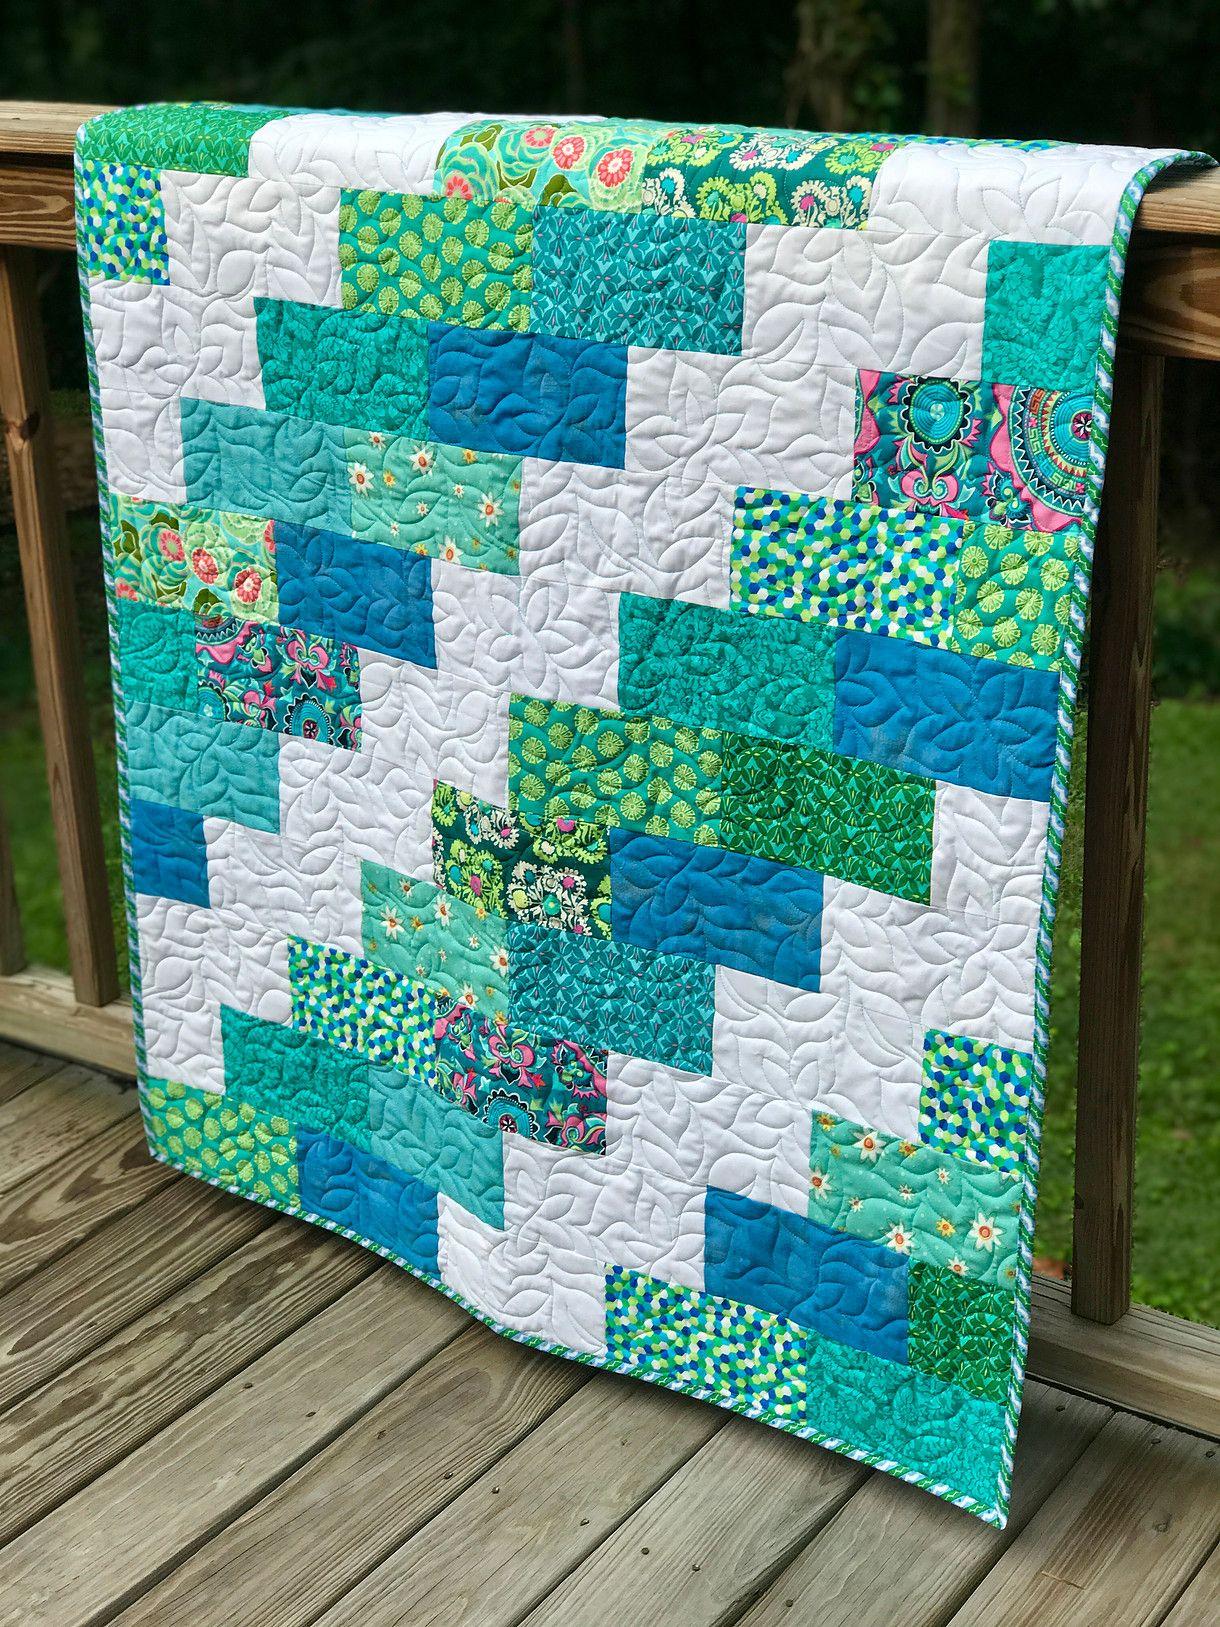 Home Rachelmhayes Quilts Beginner Quilt Patterns Quilt Patterns